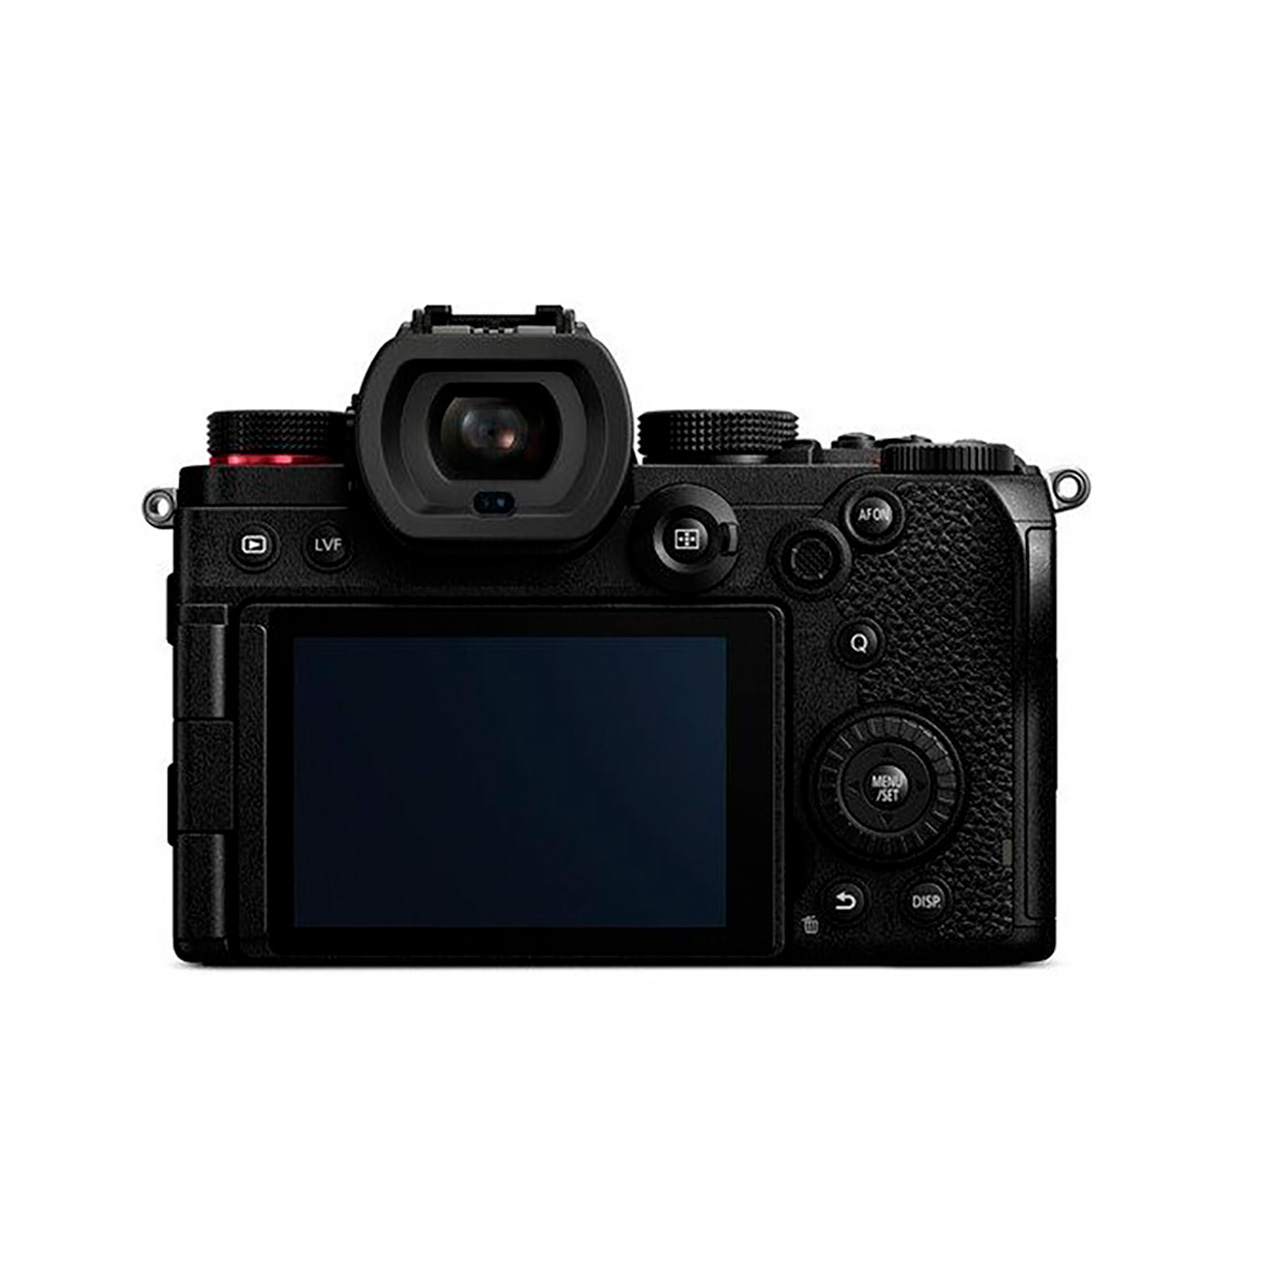 Panasonic Cámara Evil Lumix S5 + Objetivo 20-60mm + Objetivo 50mm F1.8 Negra